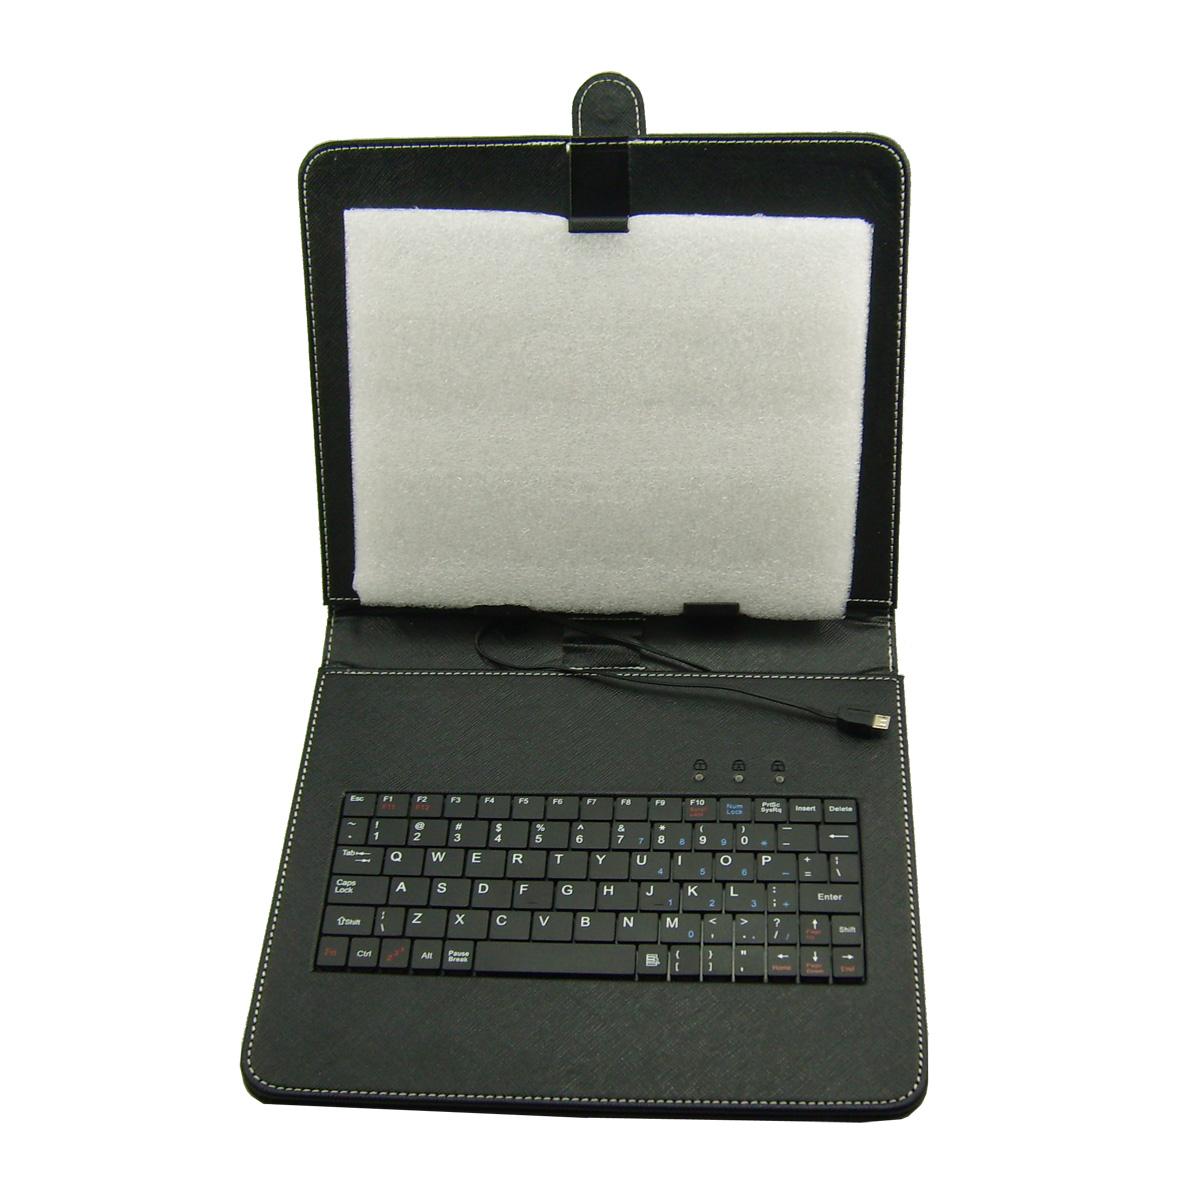 Circumscribing 9.7 flat keyboard holsteins belt mount small flat panel micro usb(China (Mainland))